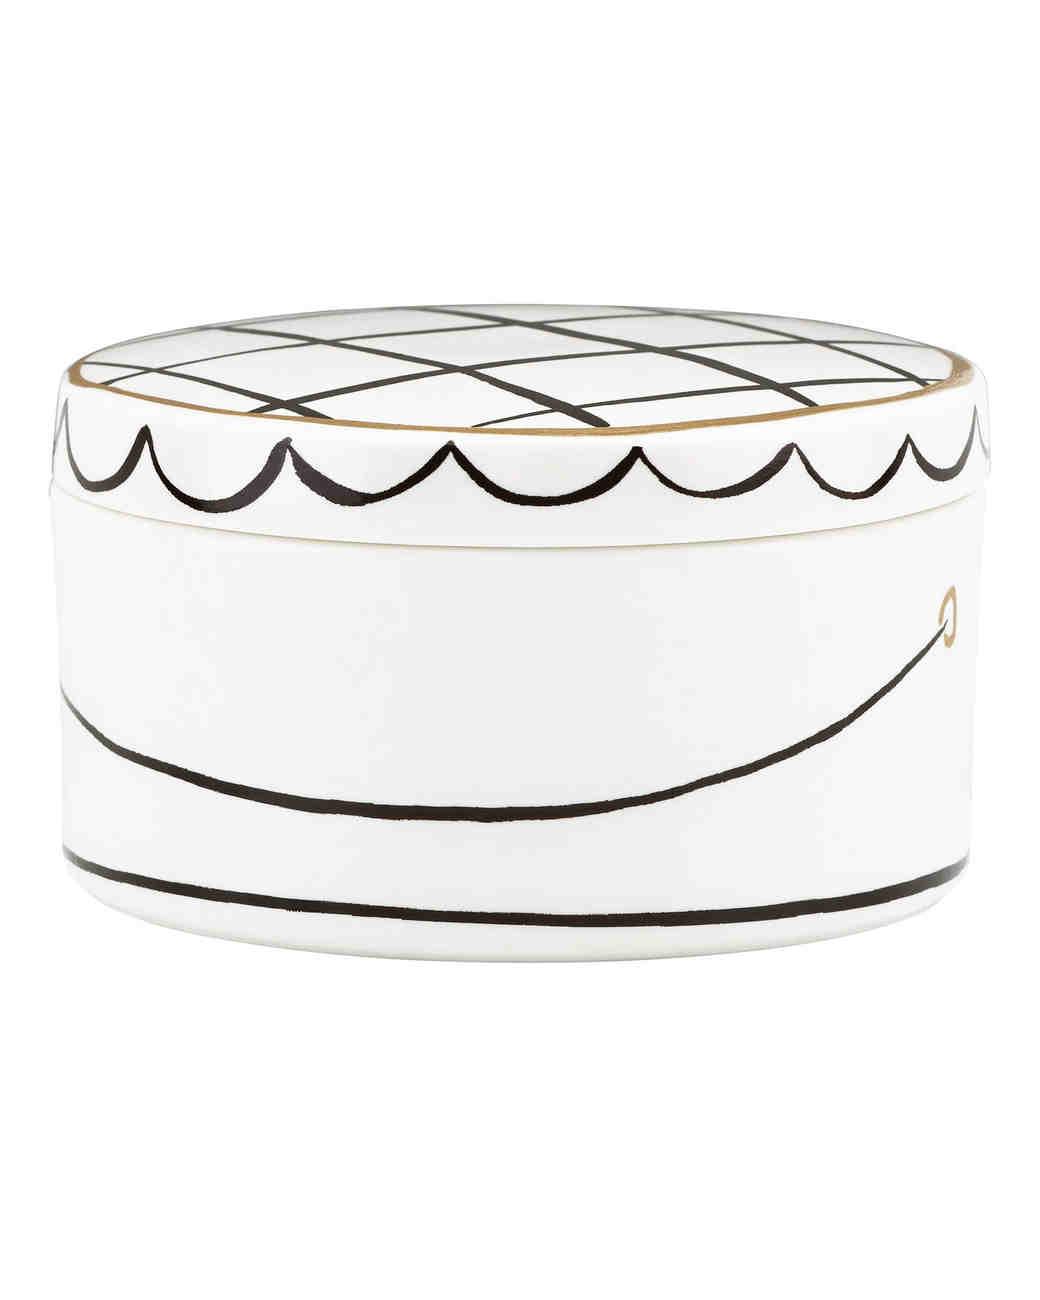 unique-ring-box-daisy-place-0316.jpg